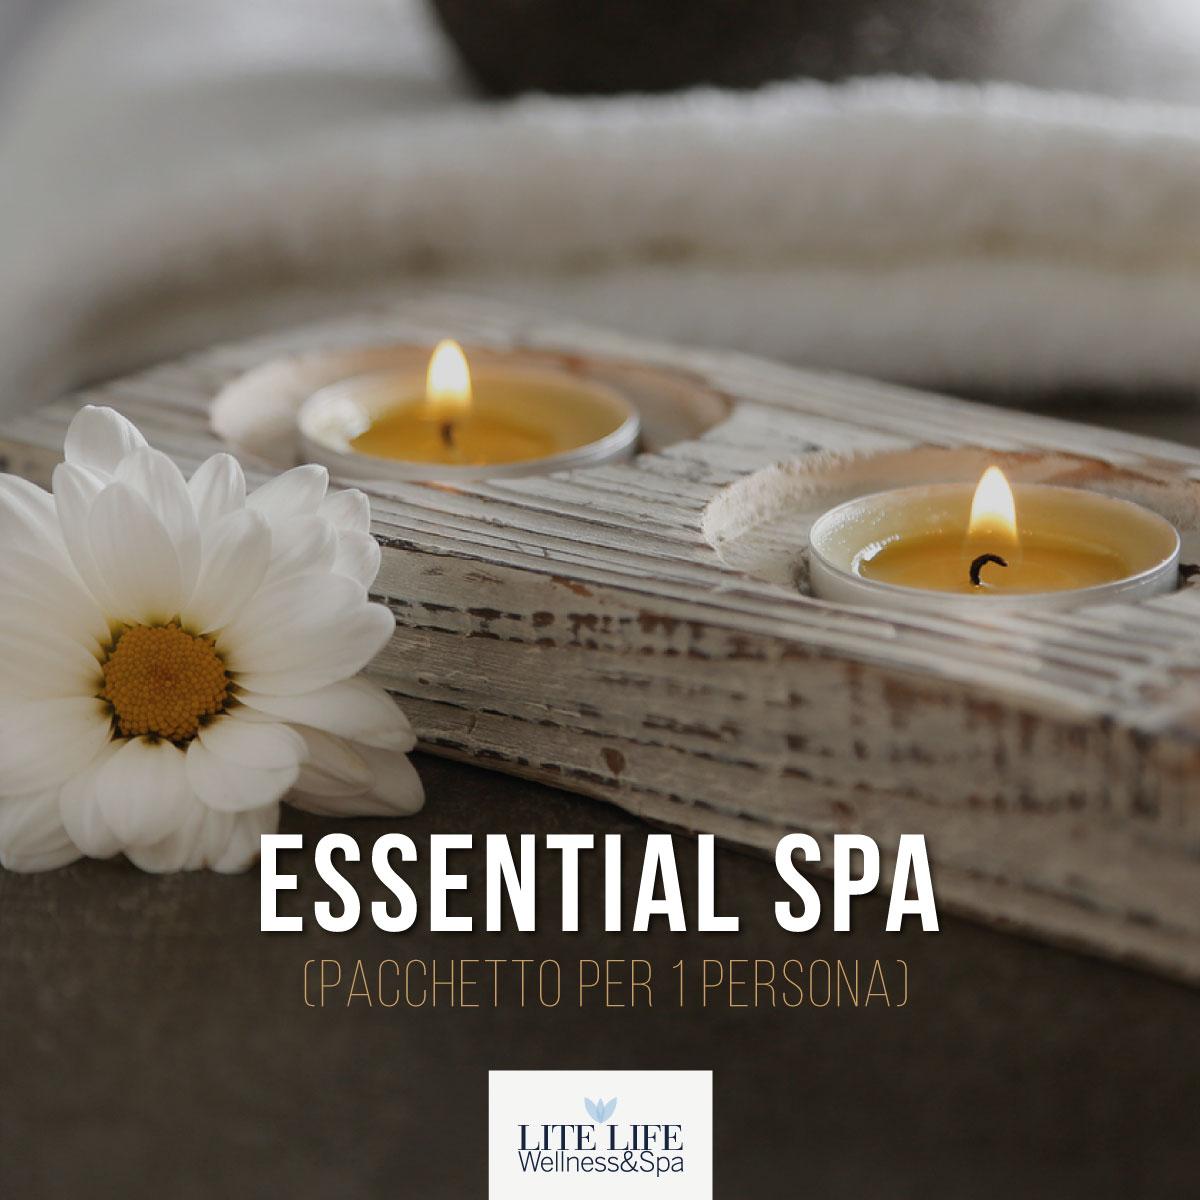 Essential Spa